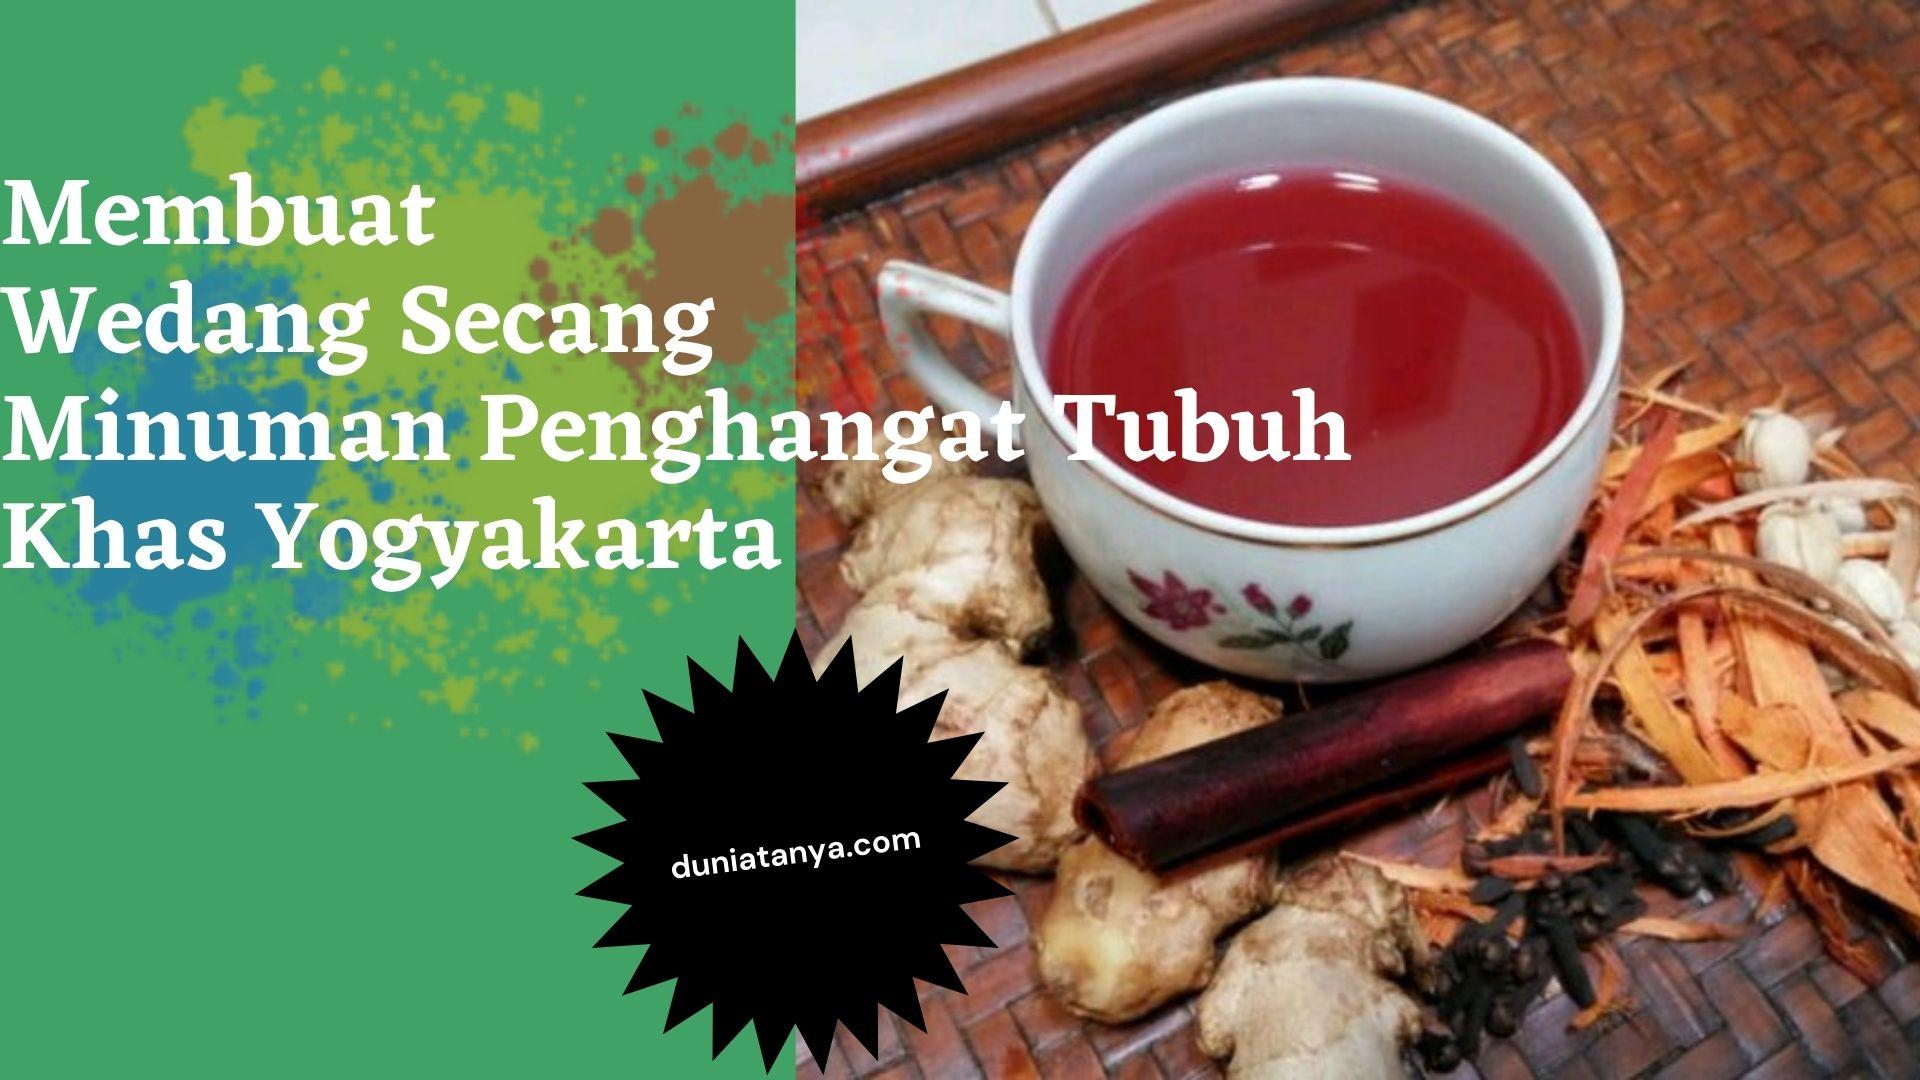 You are currently viewing Membuat Wedang Secang,Minuman Penghangat Tubuh Khas Yogyakarta